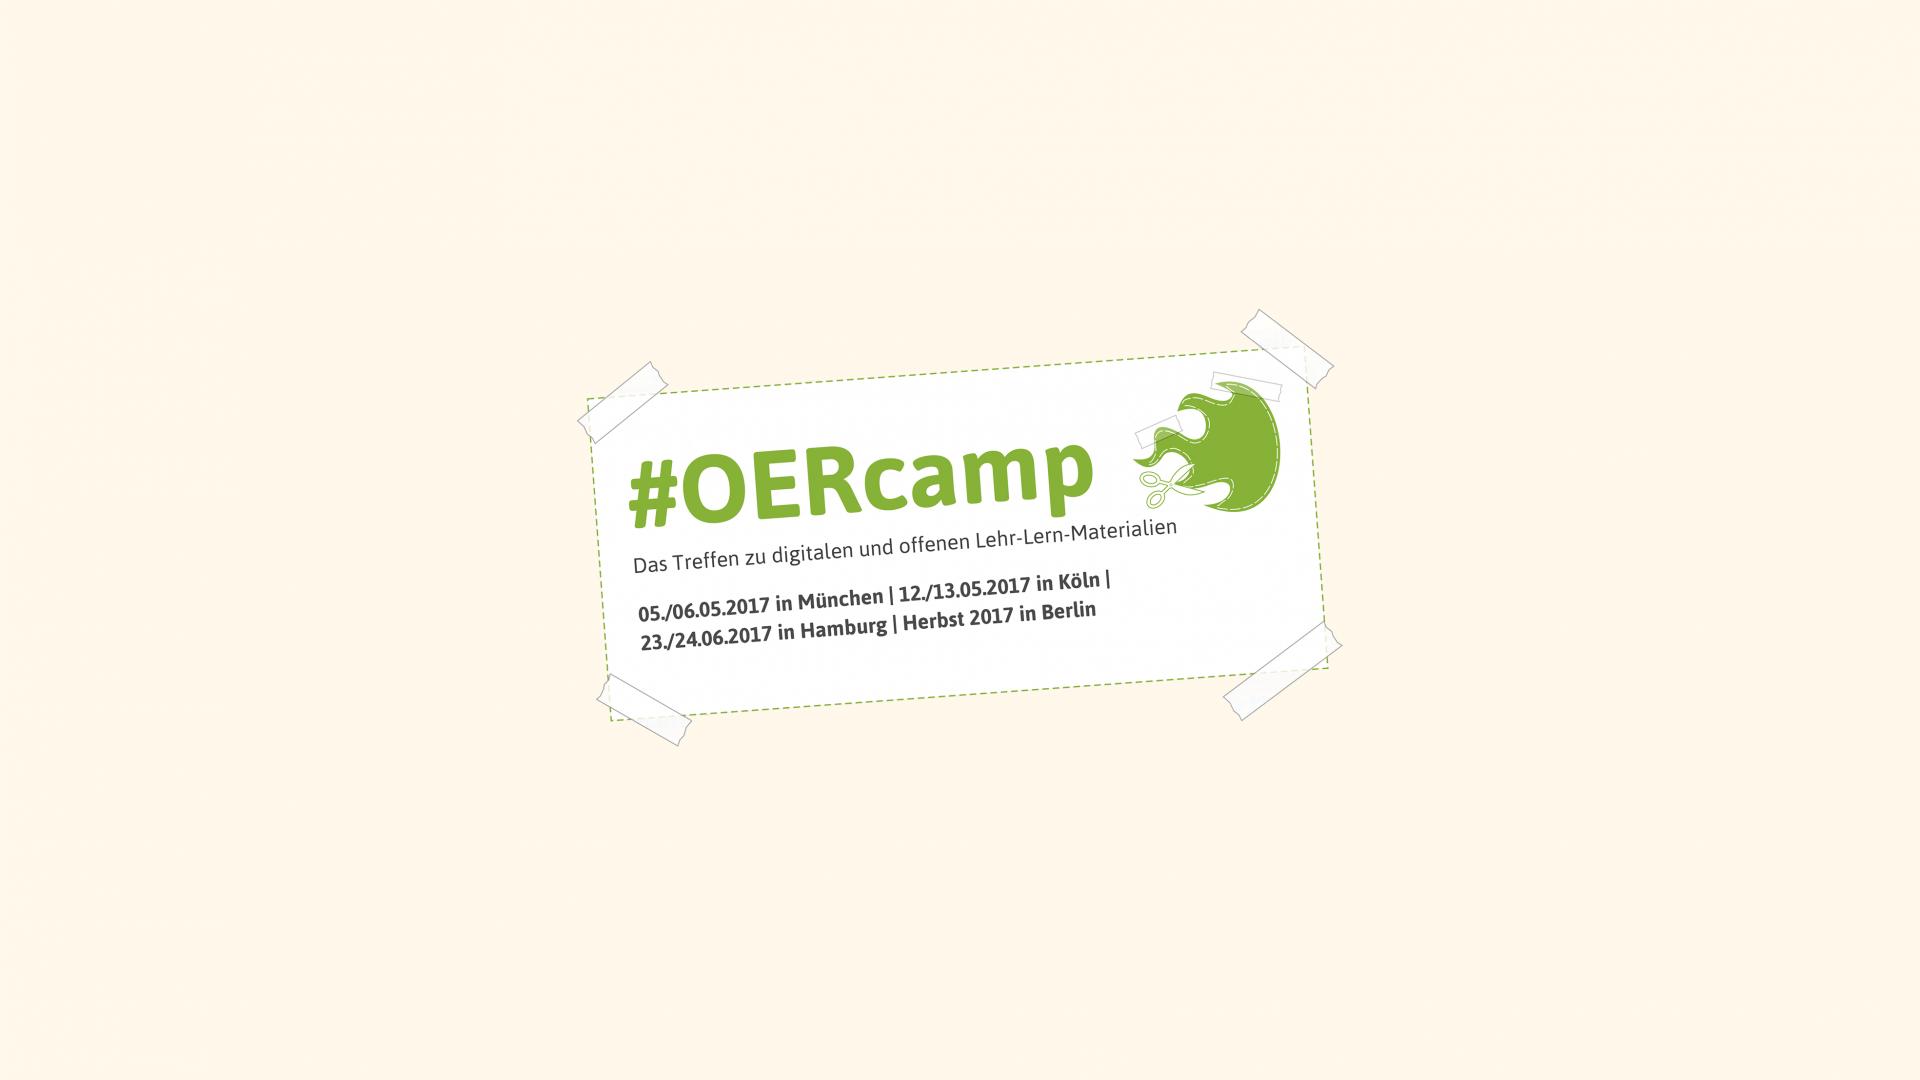 #OERcamp